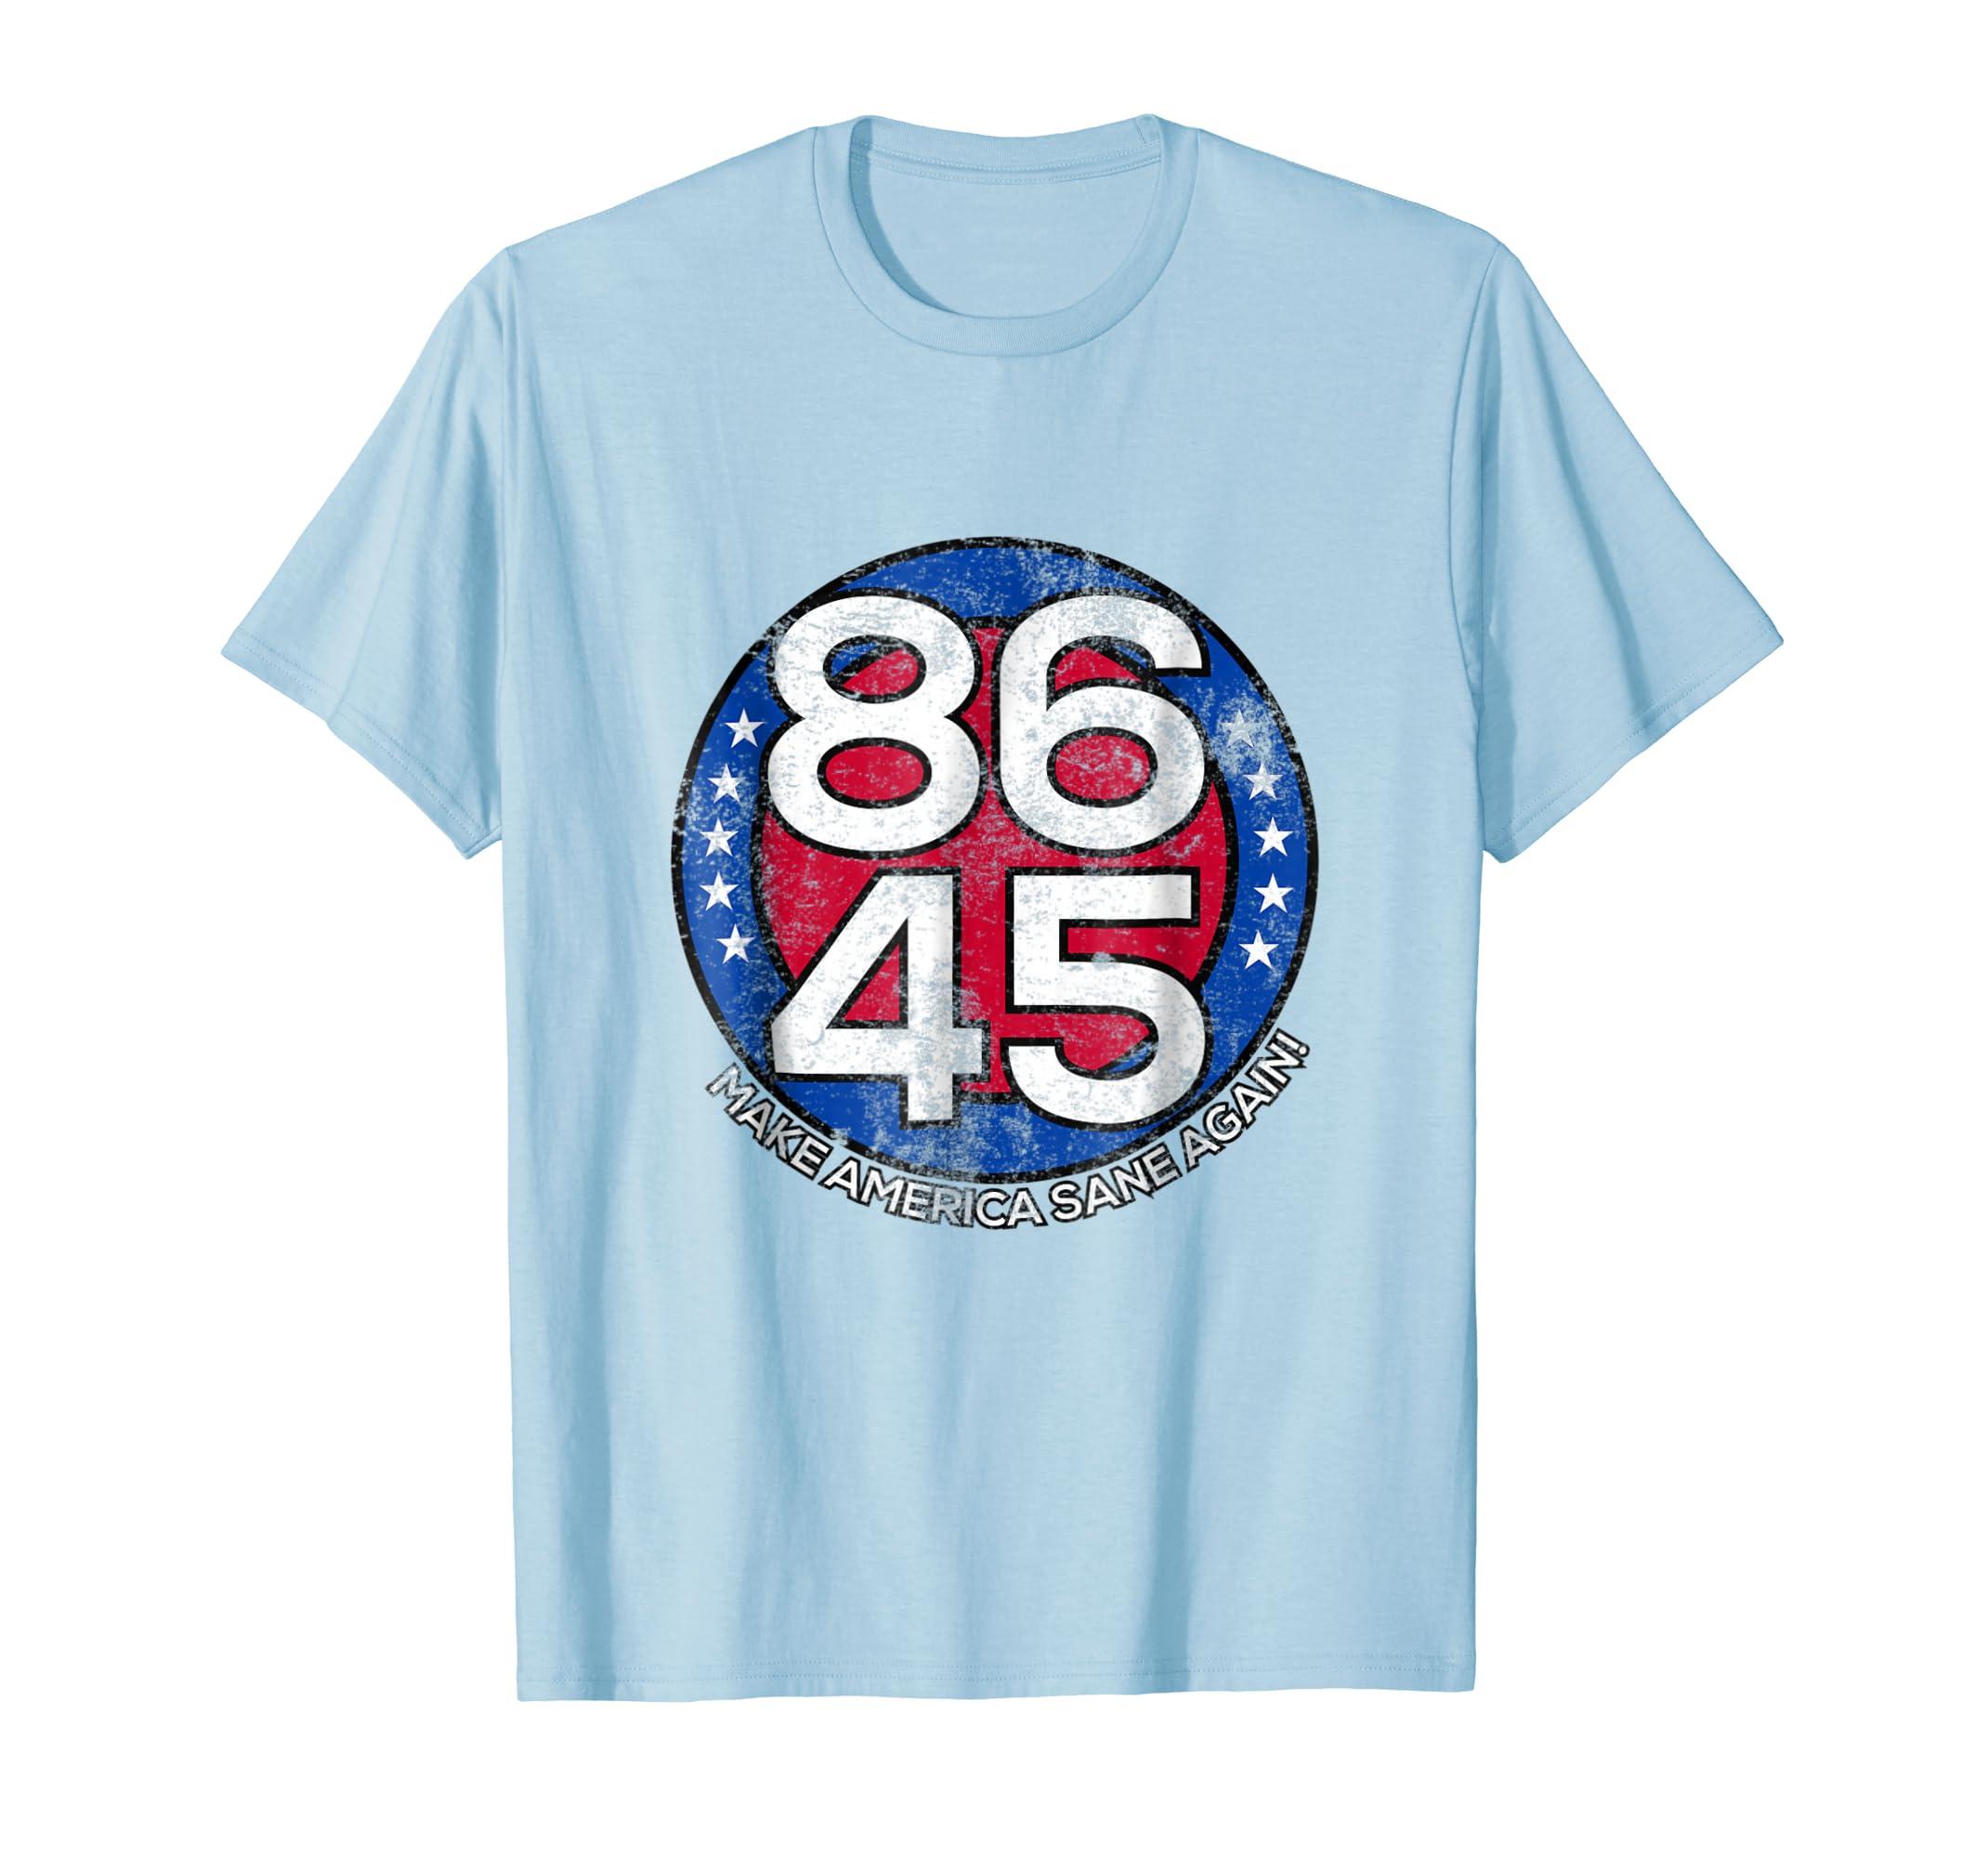 8645 Make America Sane Again   Anti Trump T Shirt